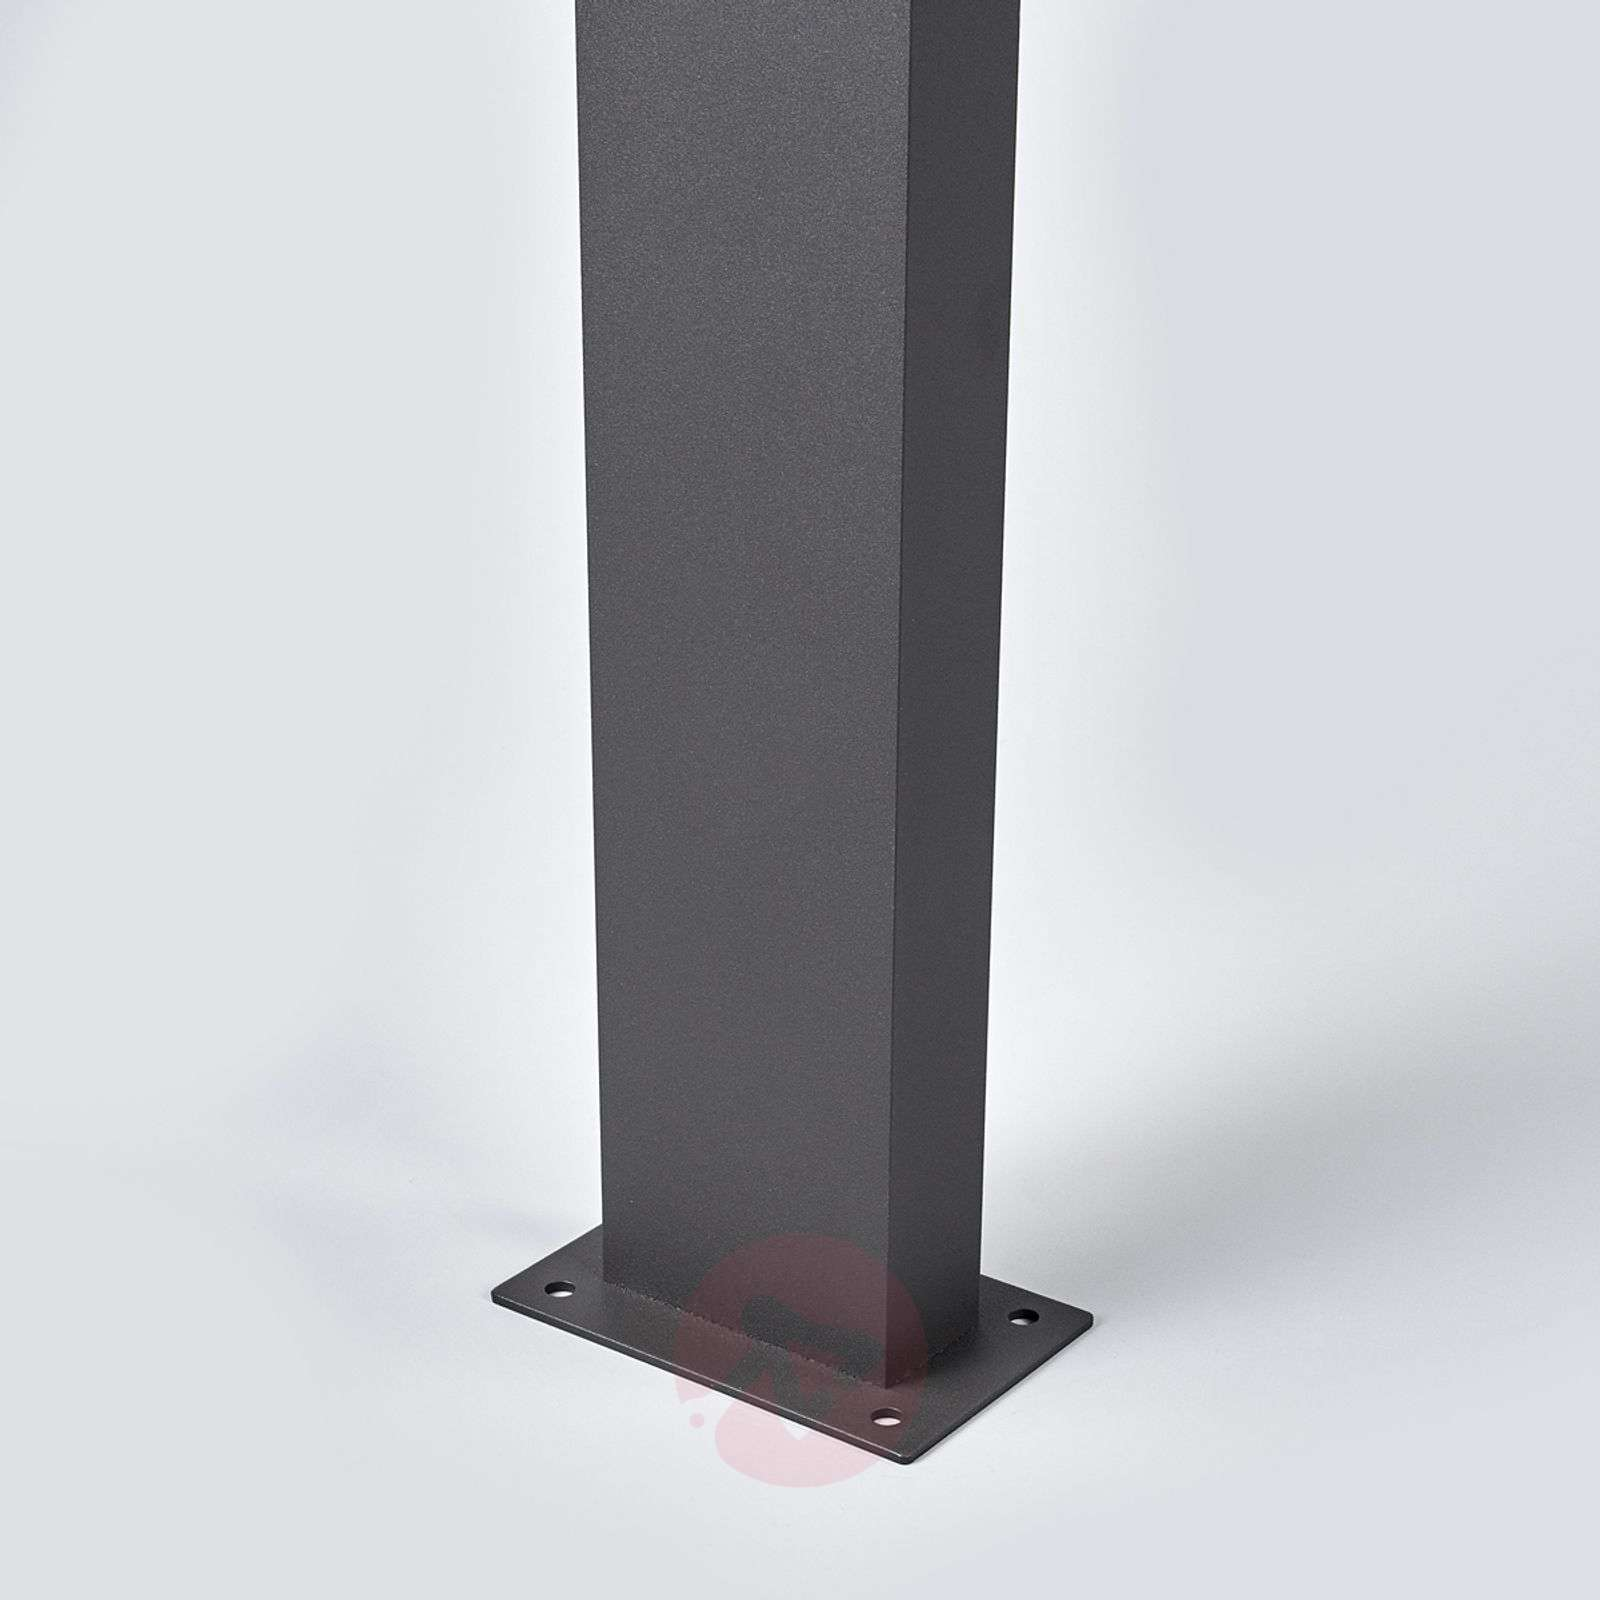 Moderni LED-pylväsvalaisin Marius-9619078-05